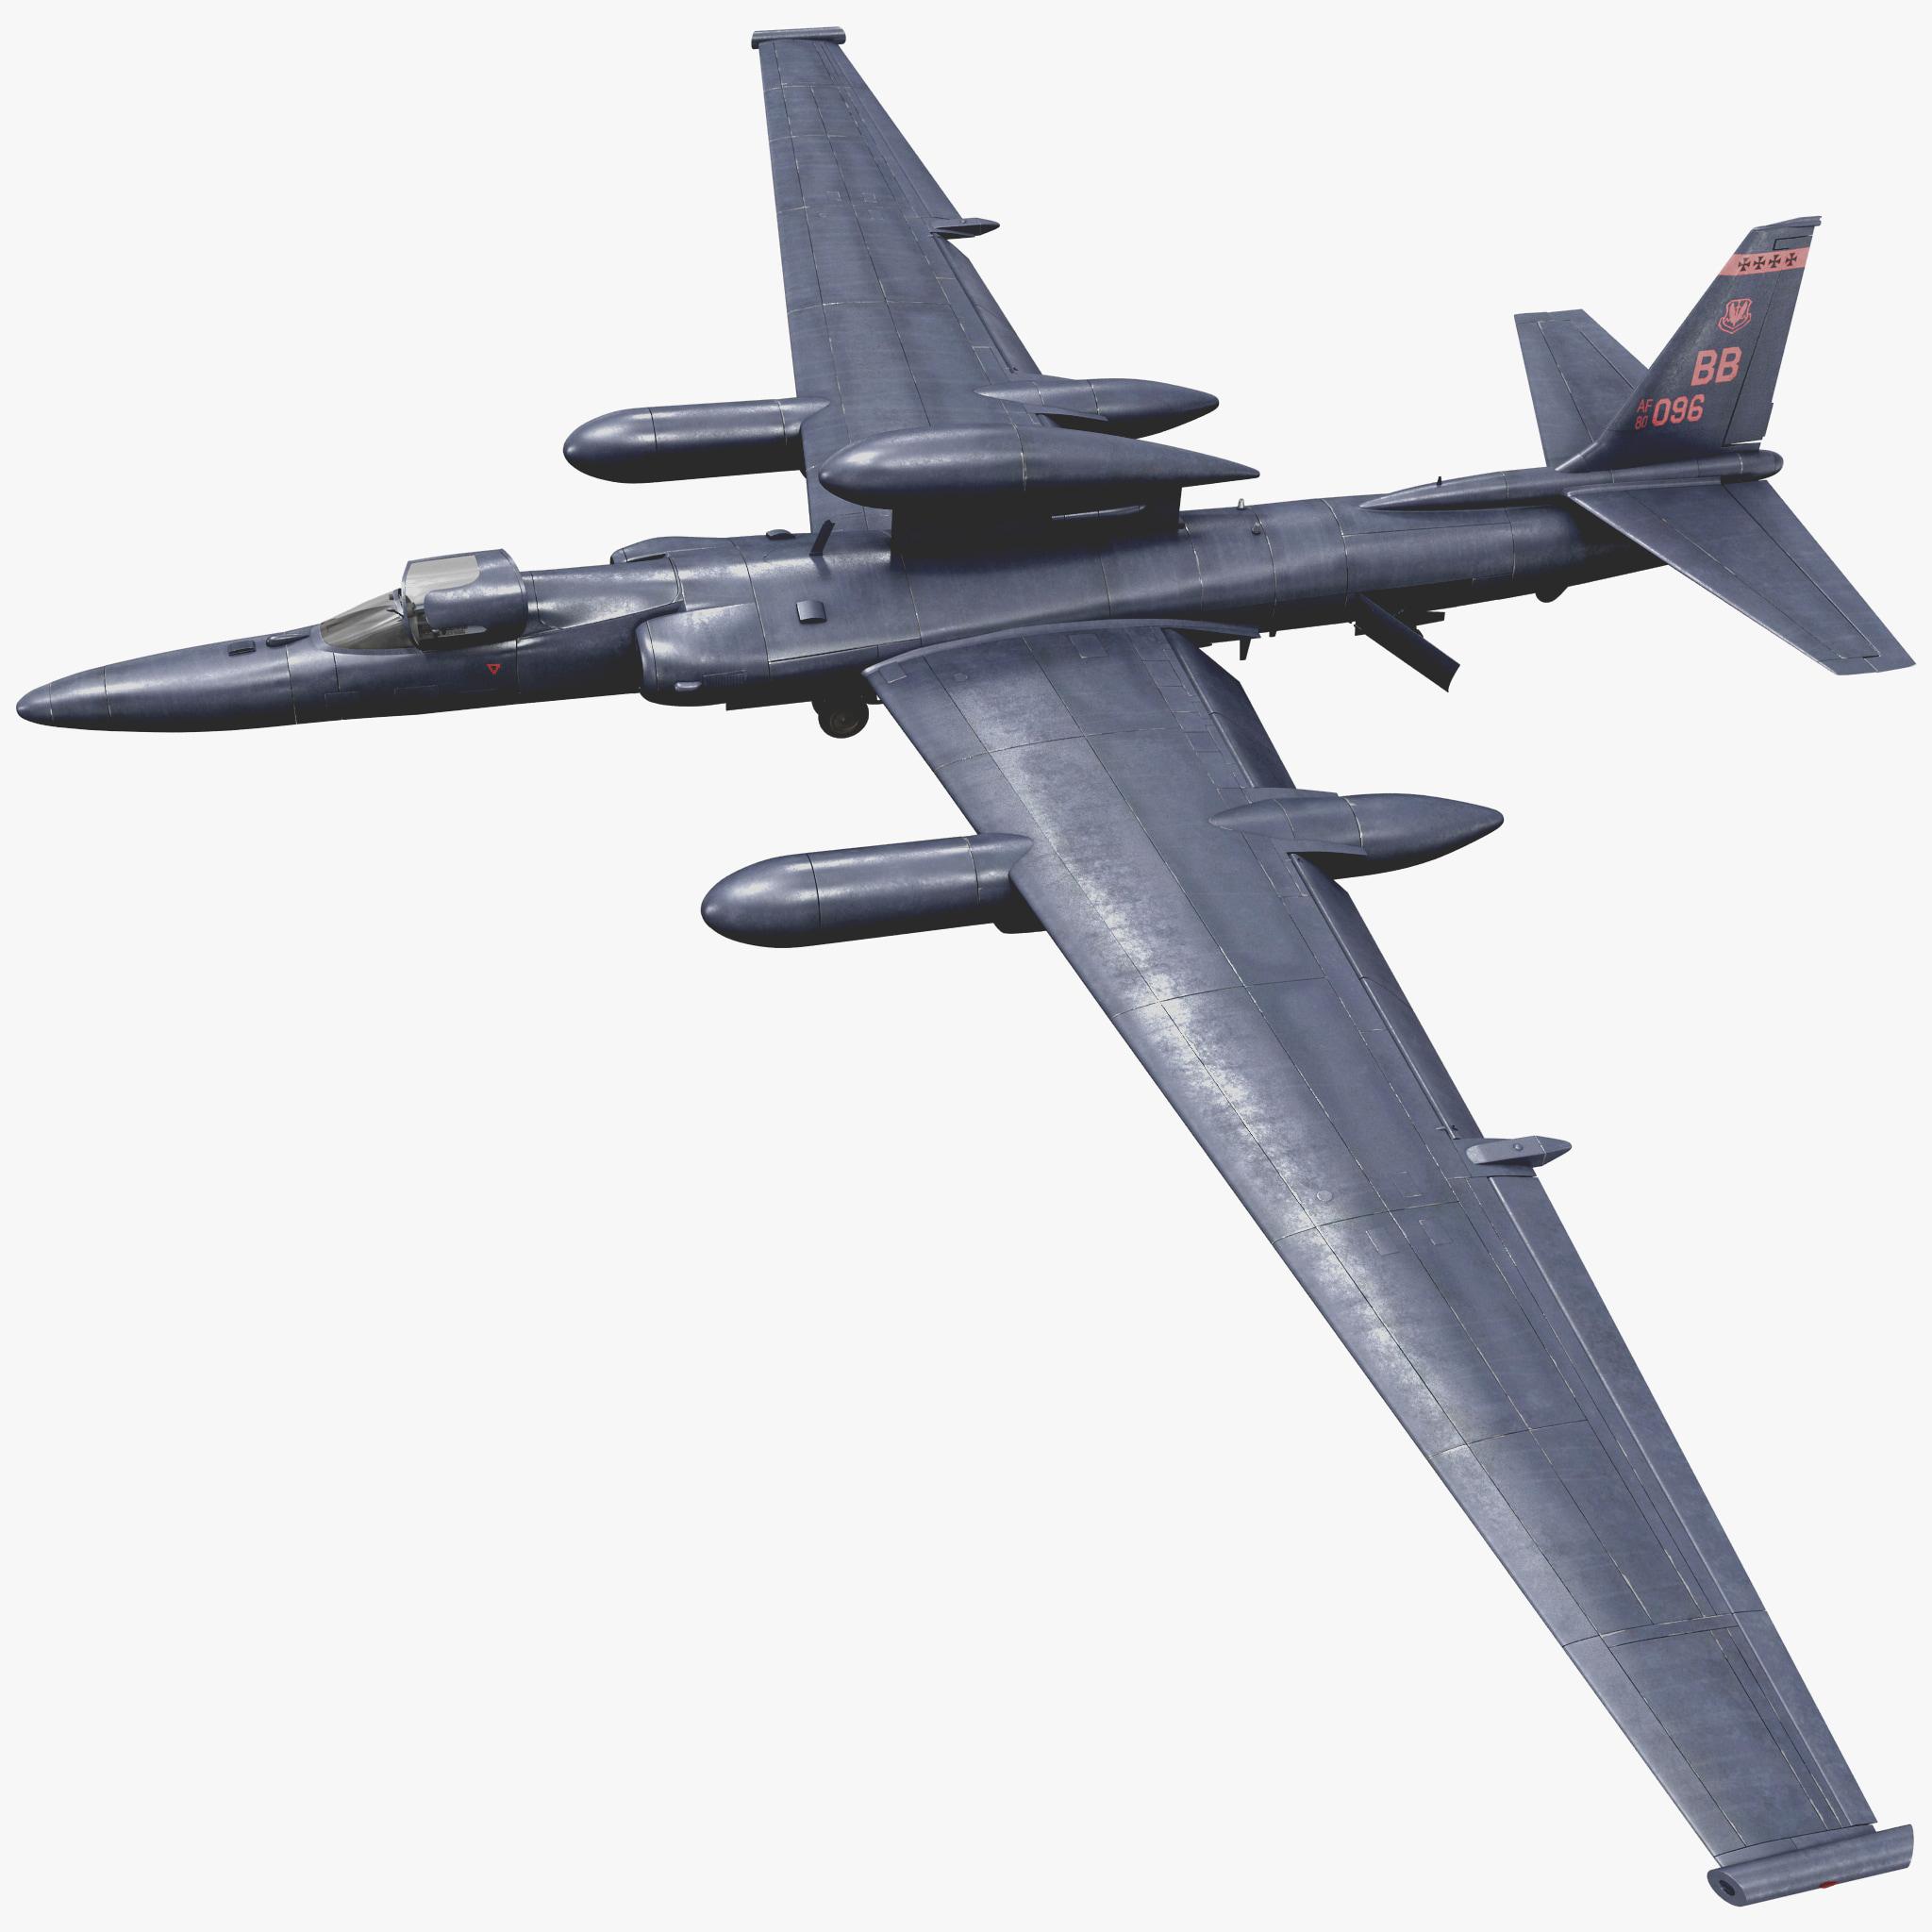 Reconnaissance Aircraft Lockheed U-2 Dragon Lady_1.jpg